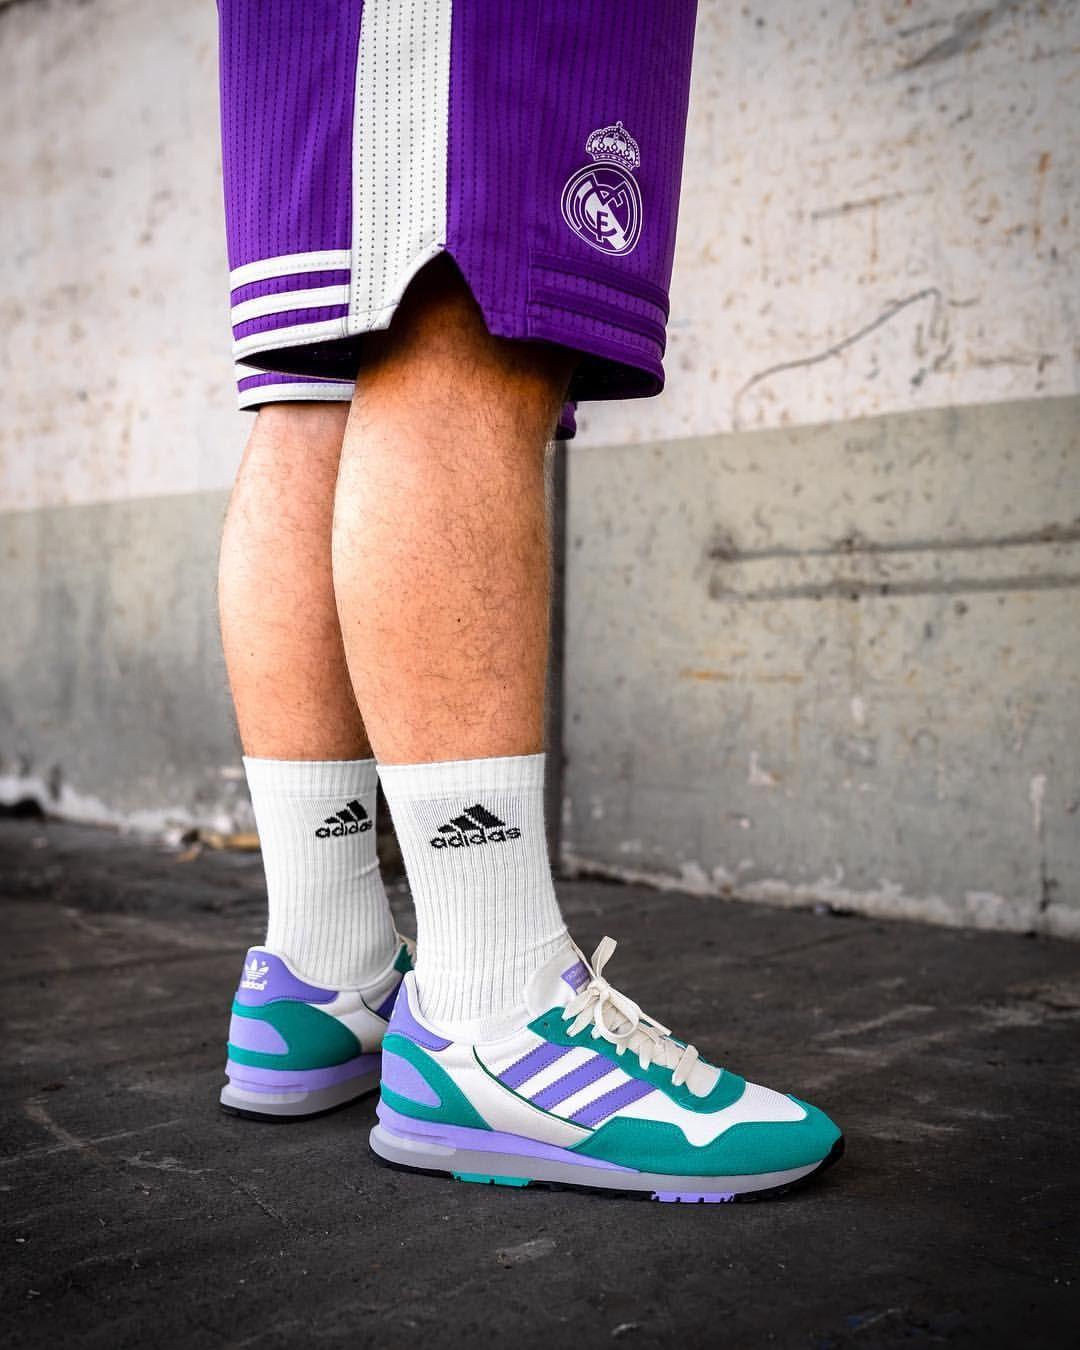 adidas Originals Lowertree SPZL | Turnschuhe, Schuhe, Turnen